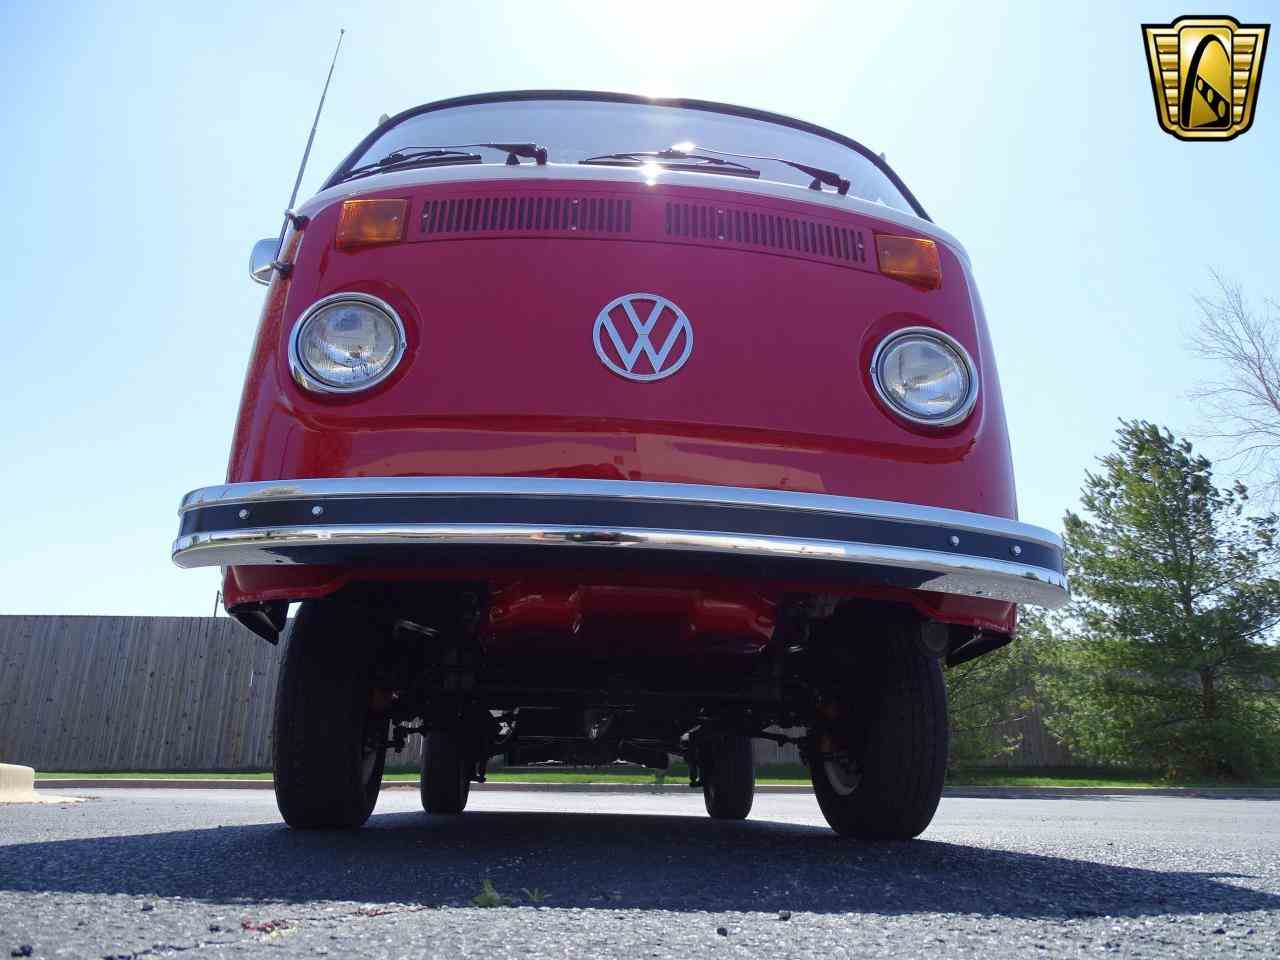 Large Picture of '74 Volkswagen Westfalia Camper located in Illinois - $34,995.00 - NEEL